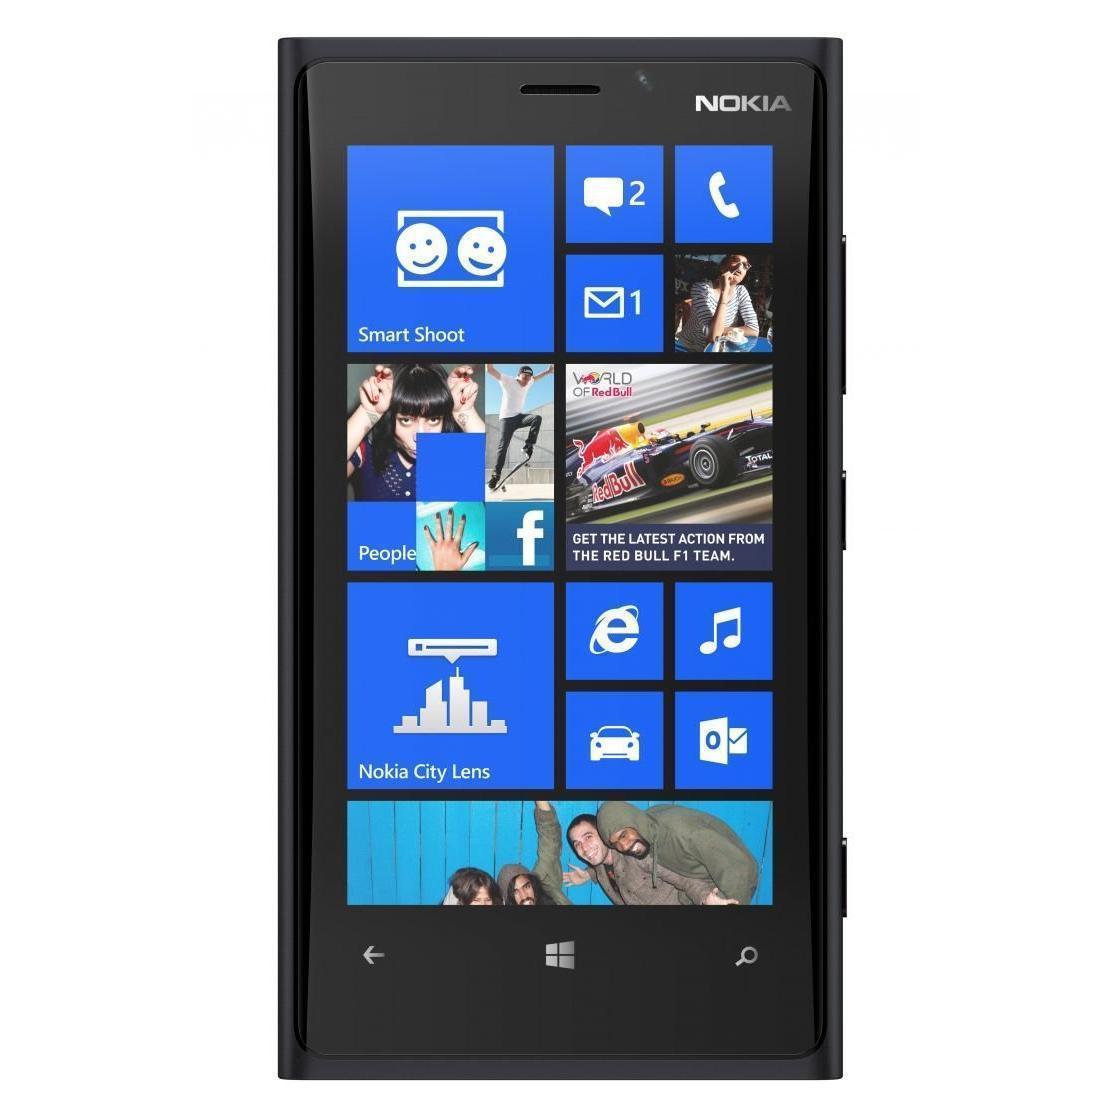 Nokia Lumia 920 32 GB - Negro - Libre